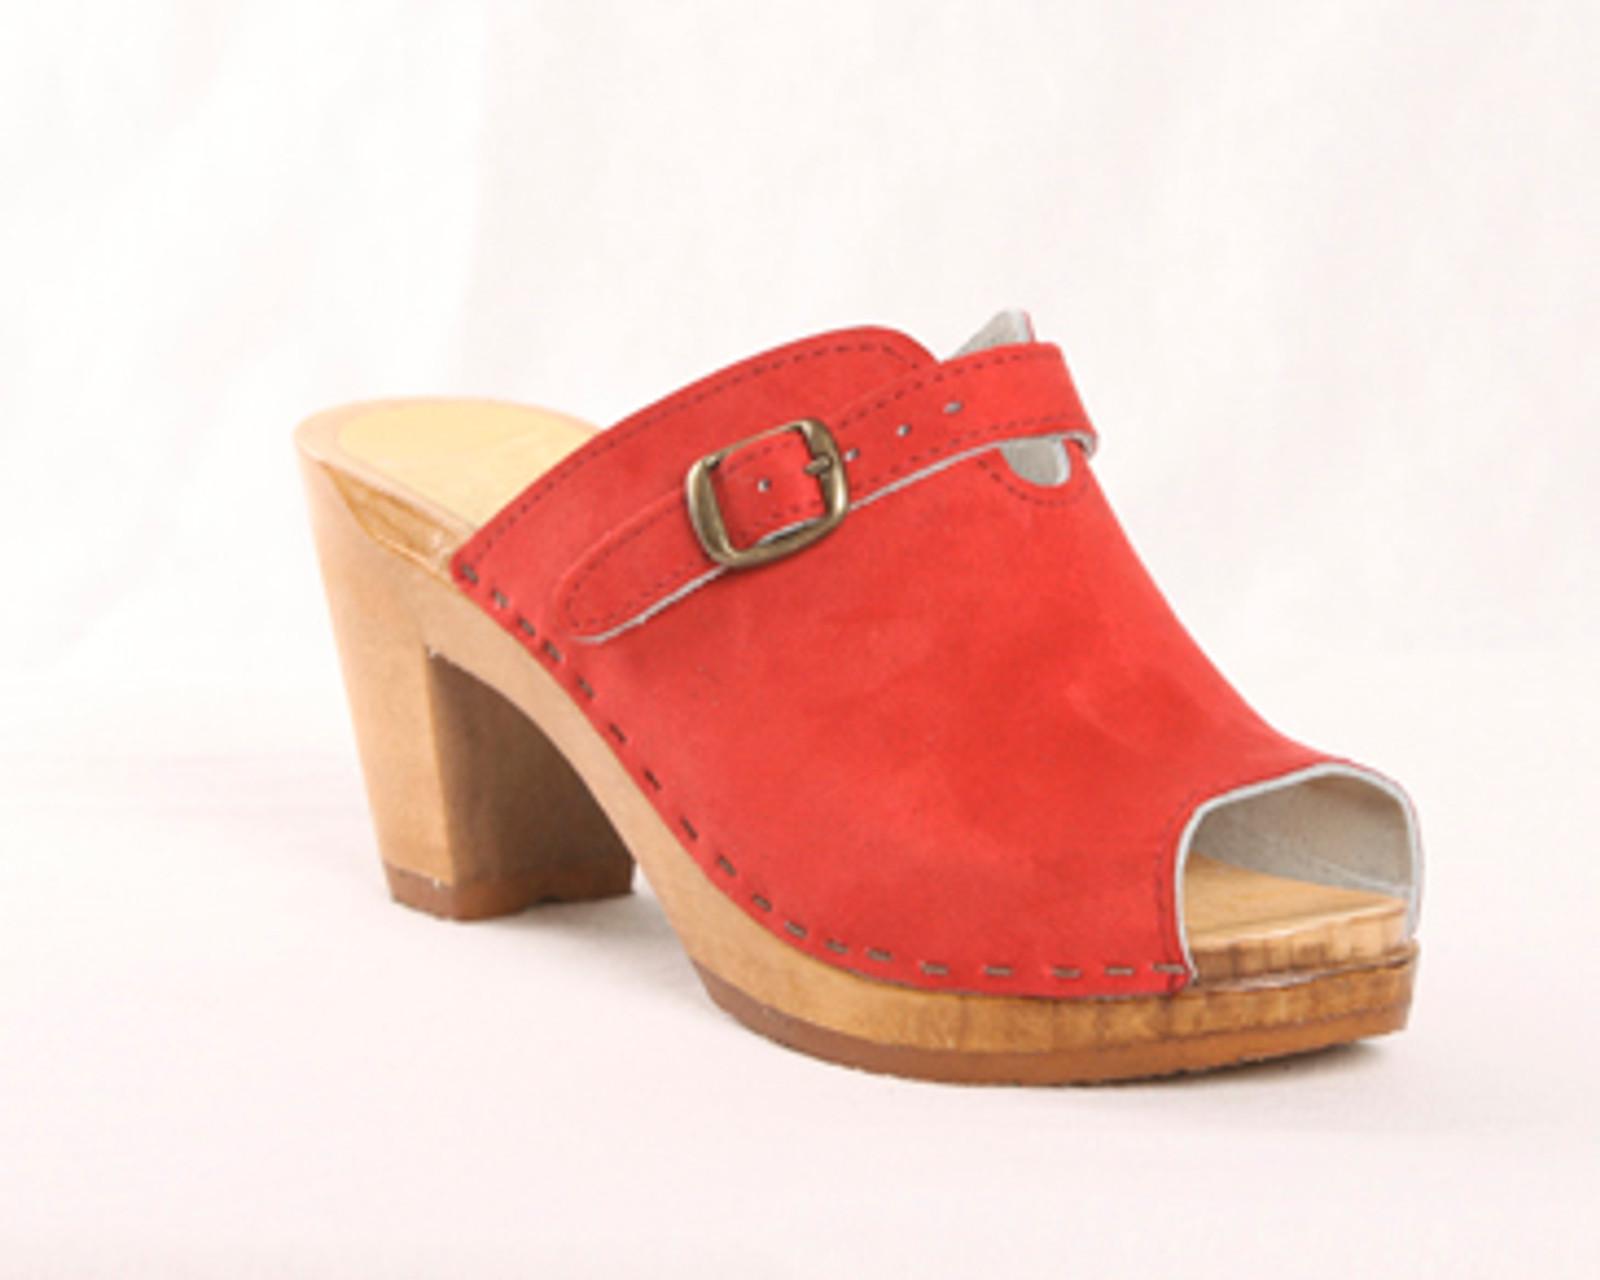 Scallop Open Toe Clogs - High Heels